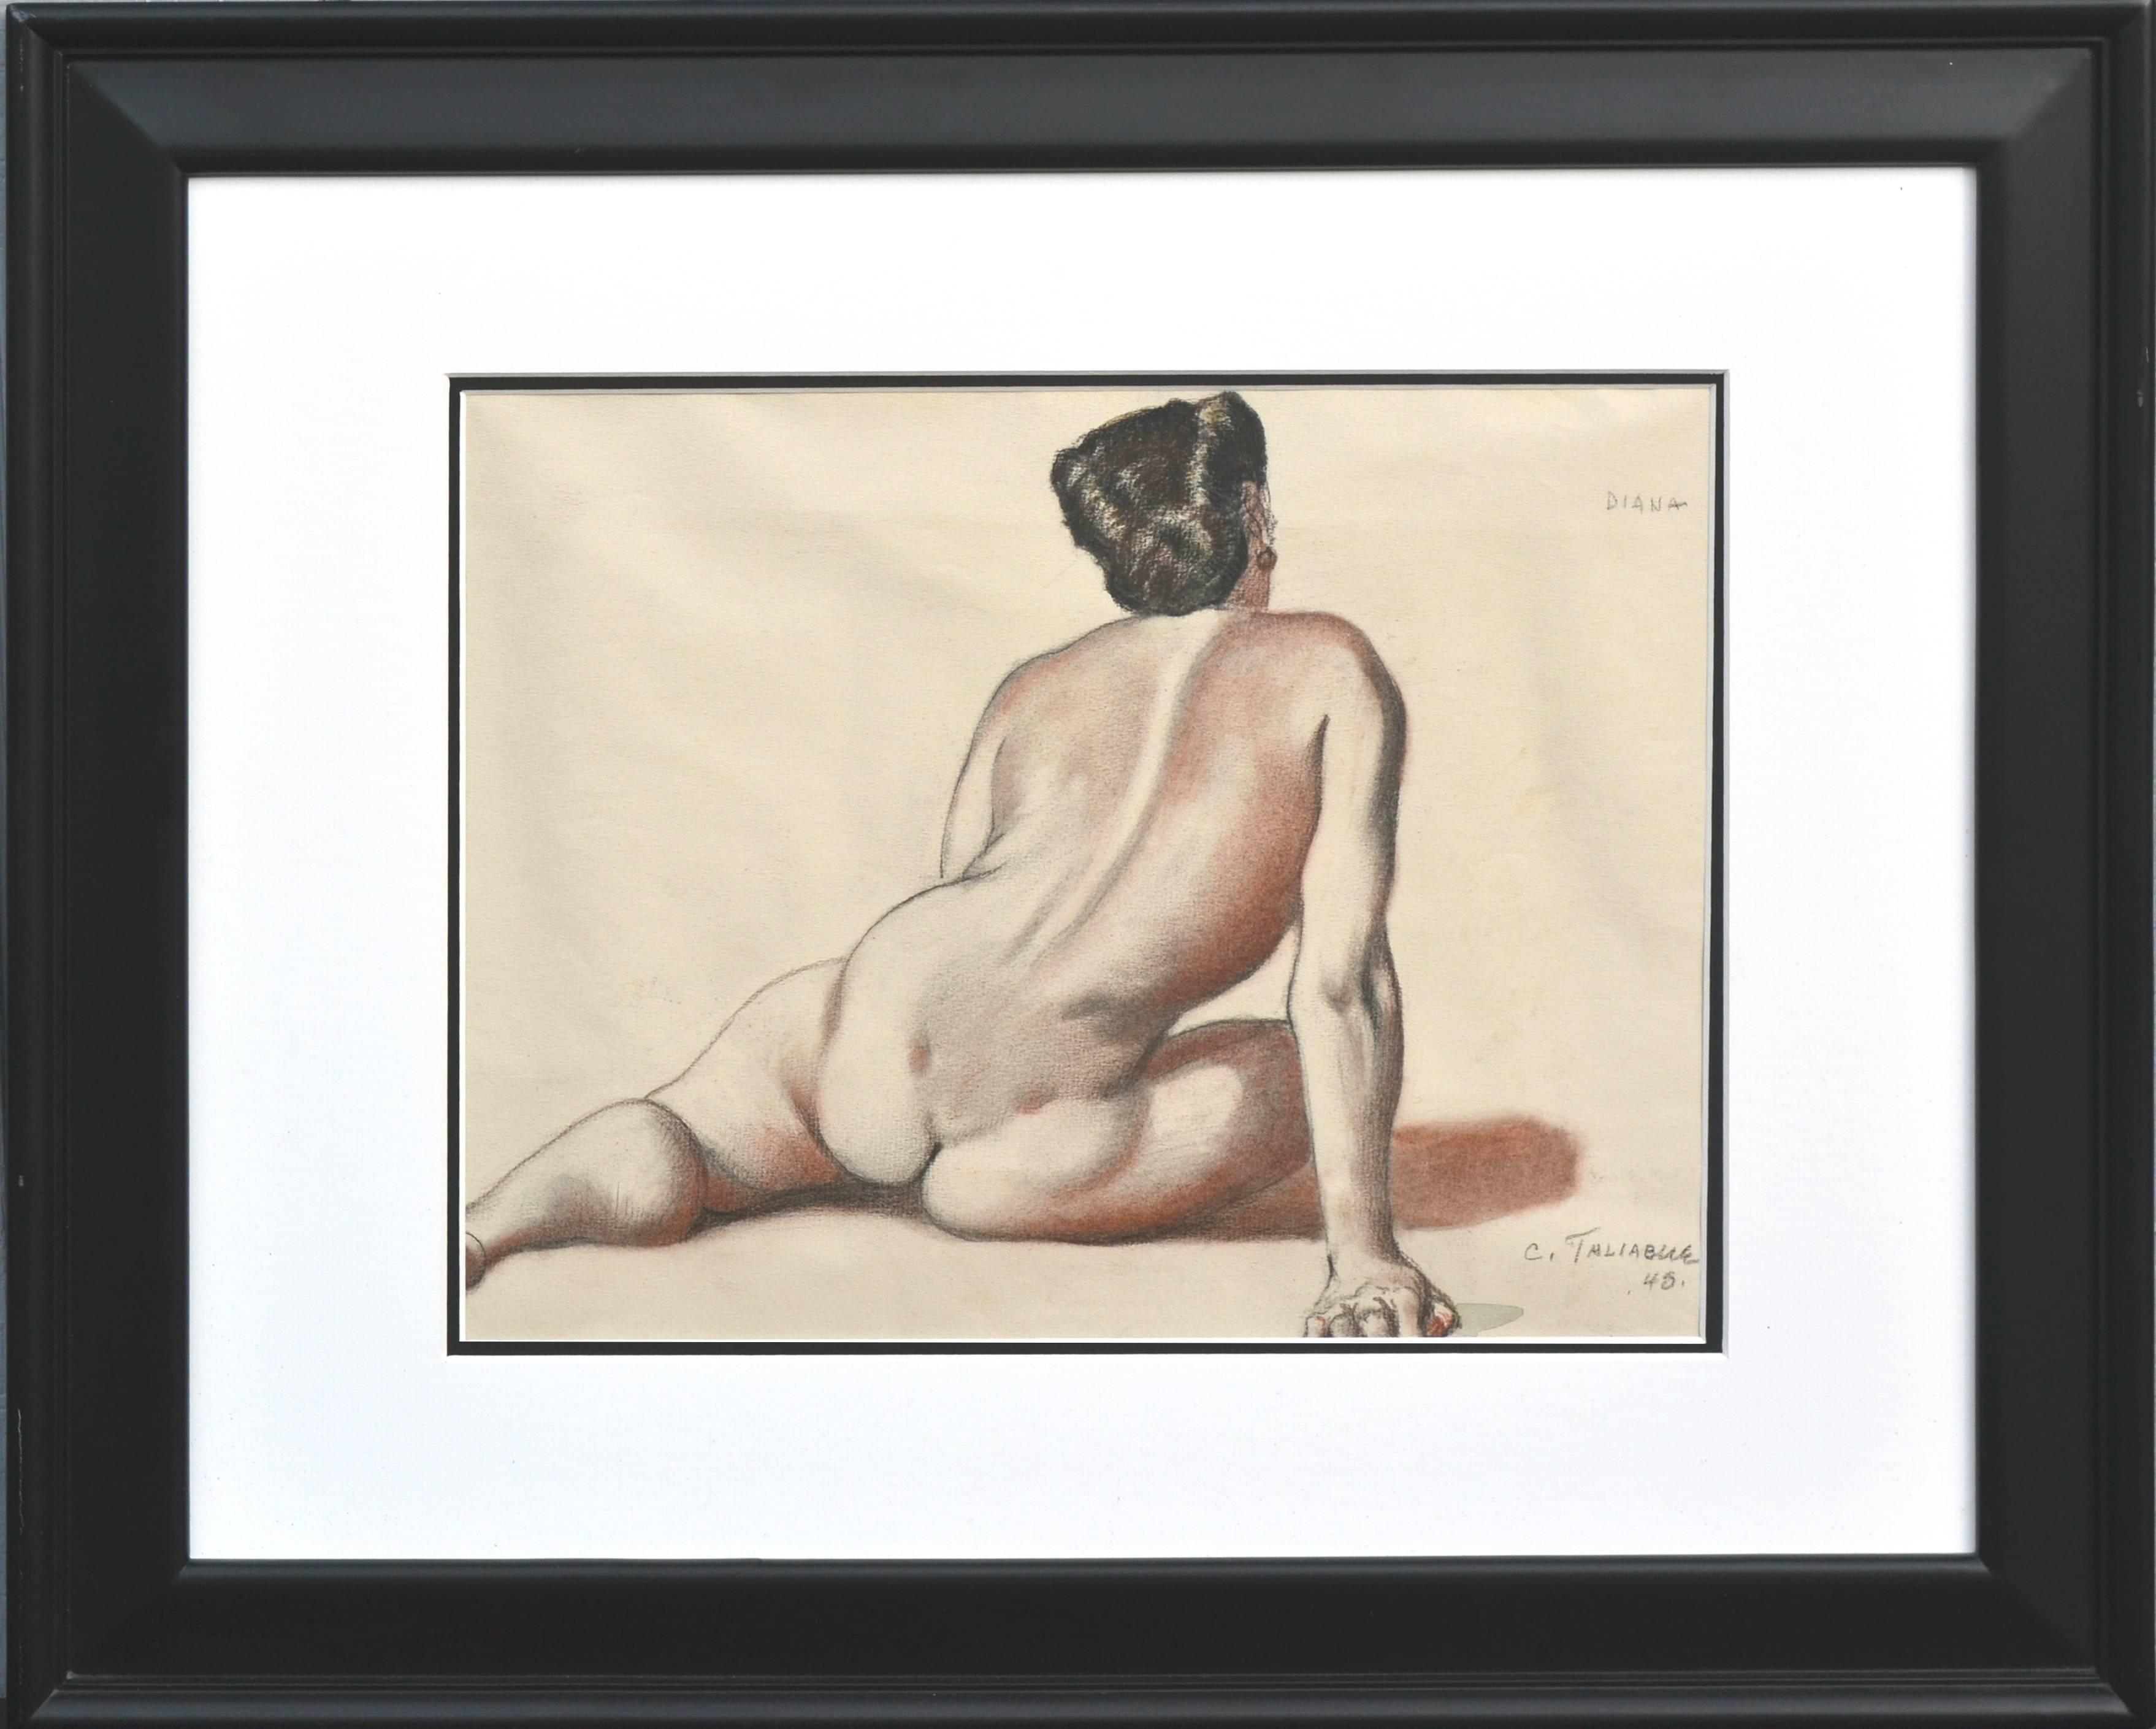 Nude Study, Diana 1948